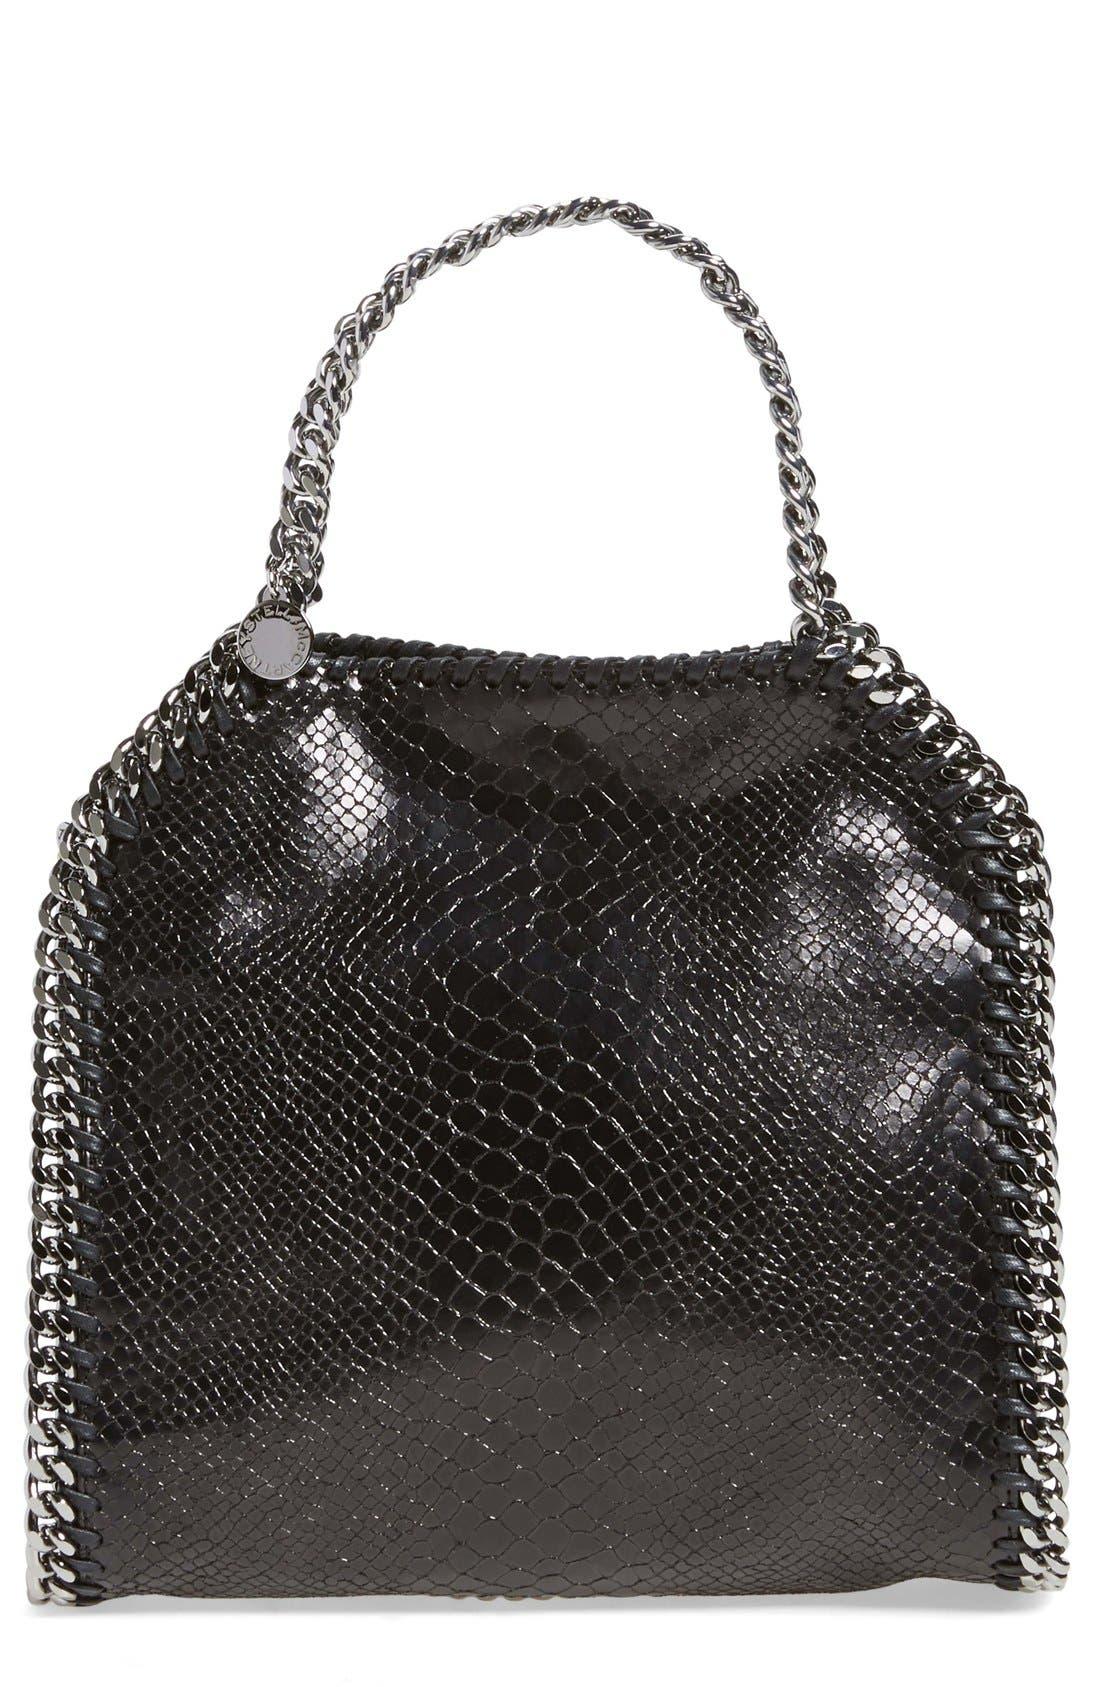 Main Image - Stella McCartney 'Mini Falabella' Snake Embossed Faux Leather Tote